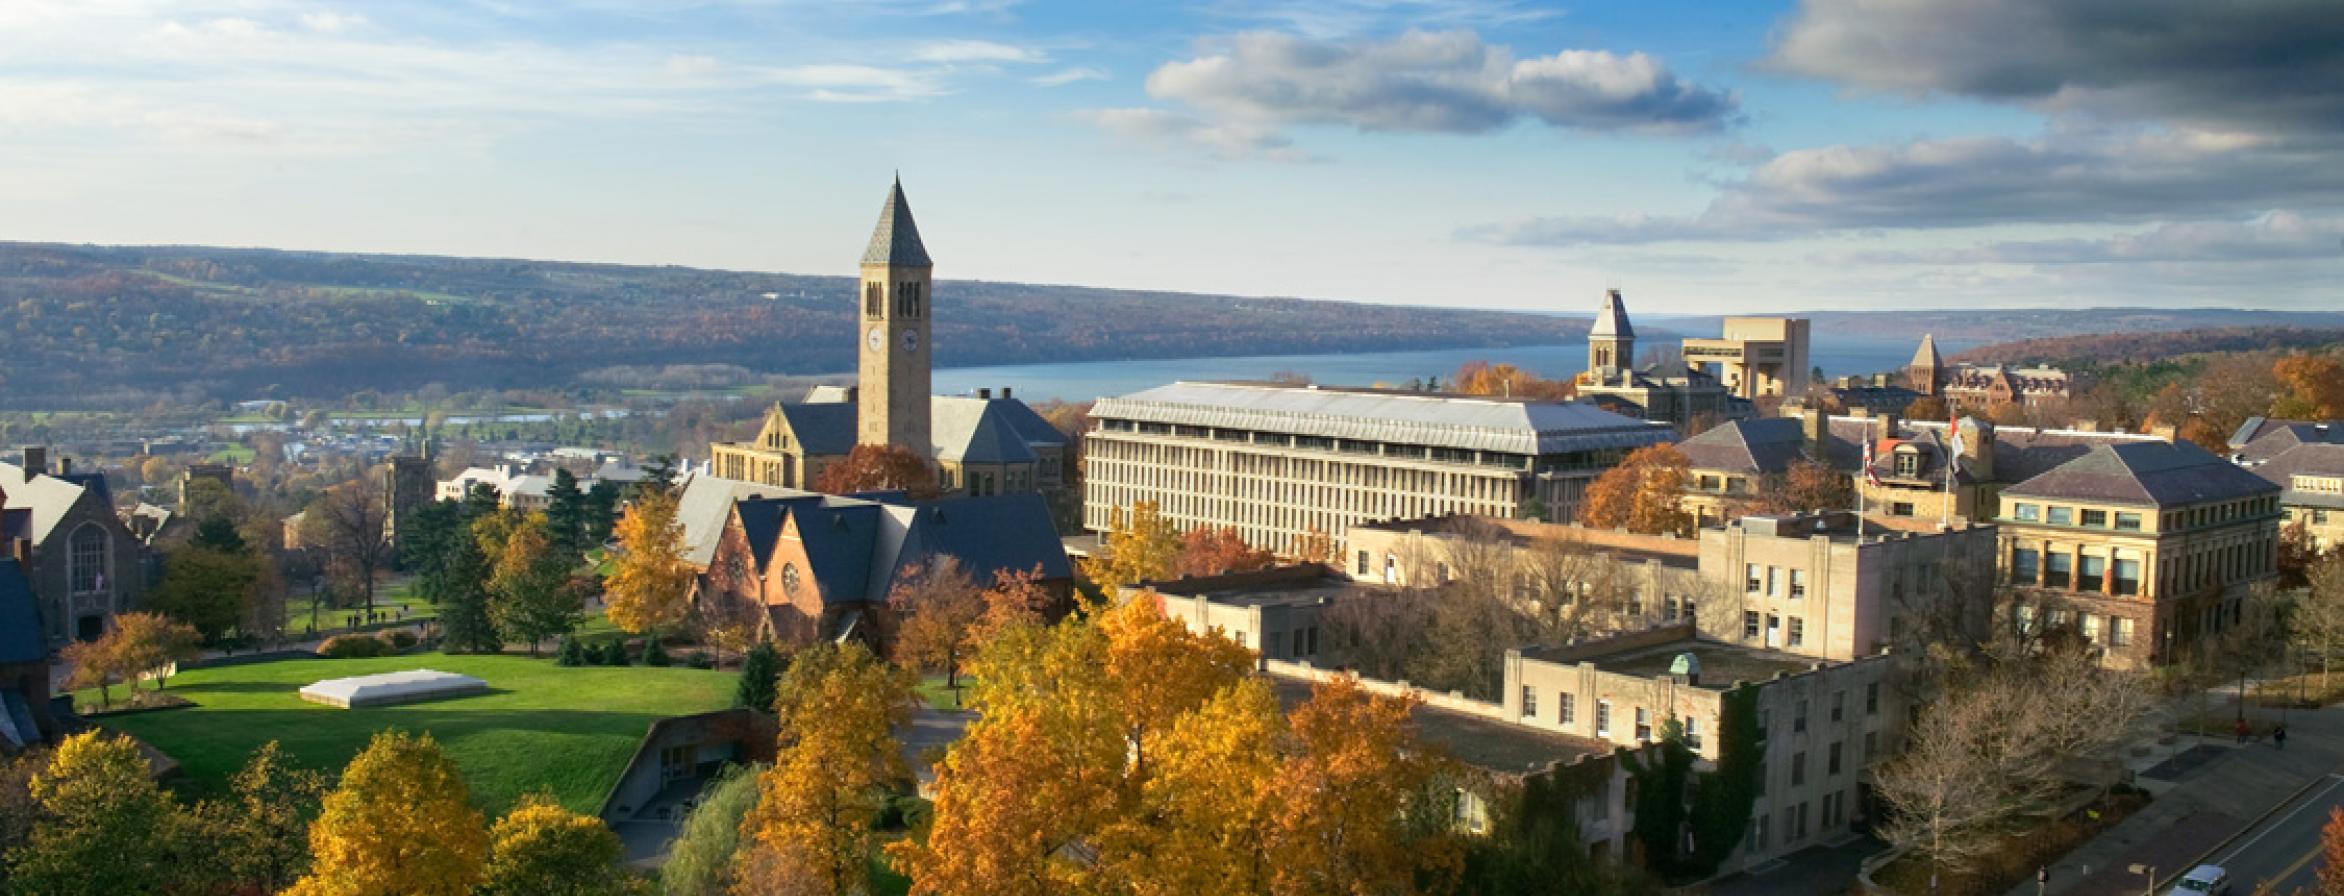 Campus de Cornell University